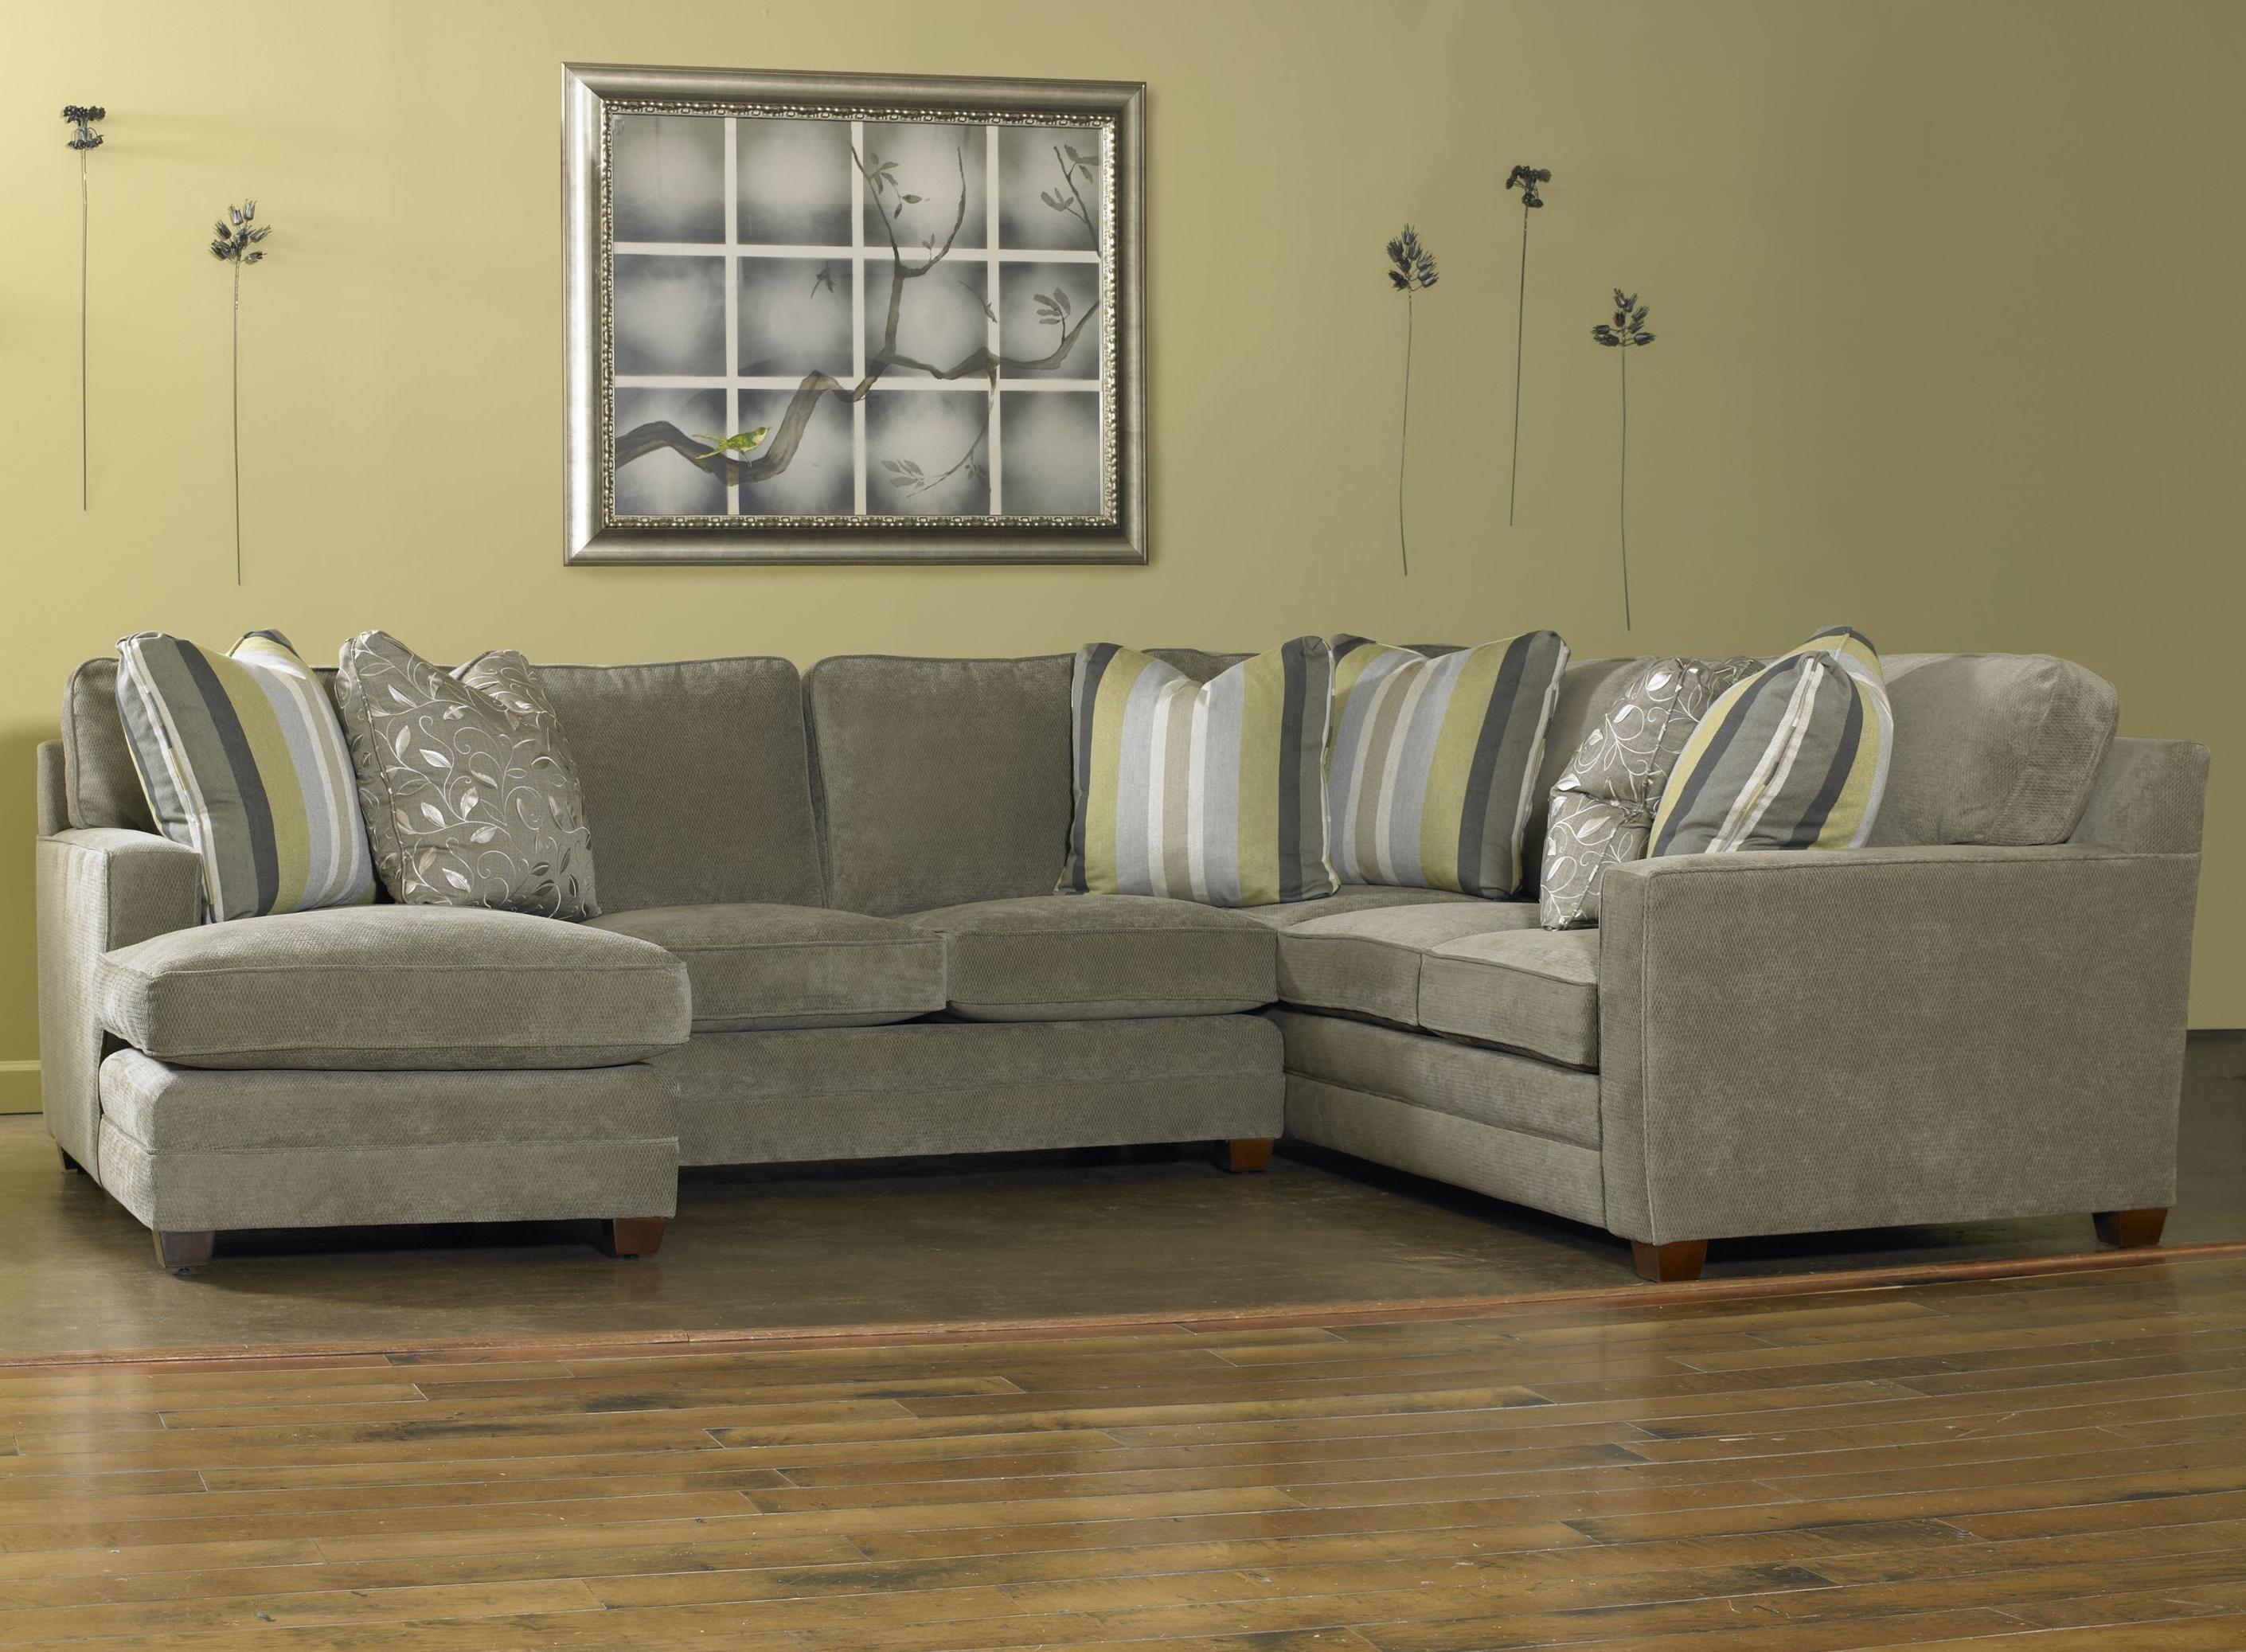 Leather Sectional Sofa Sams Club • Leather Sofa Intended For Sams Club Sectional Sofas (Image 5 of 10)